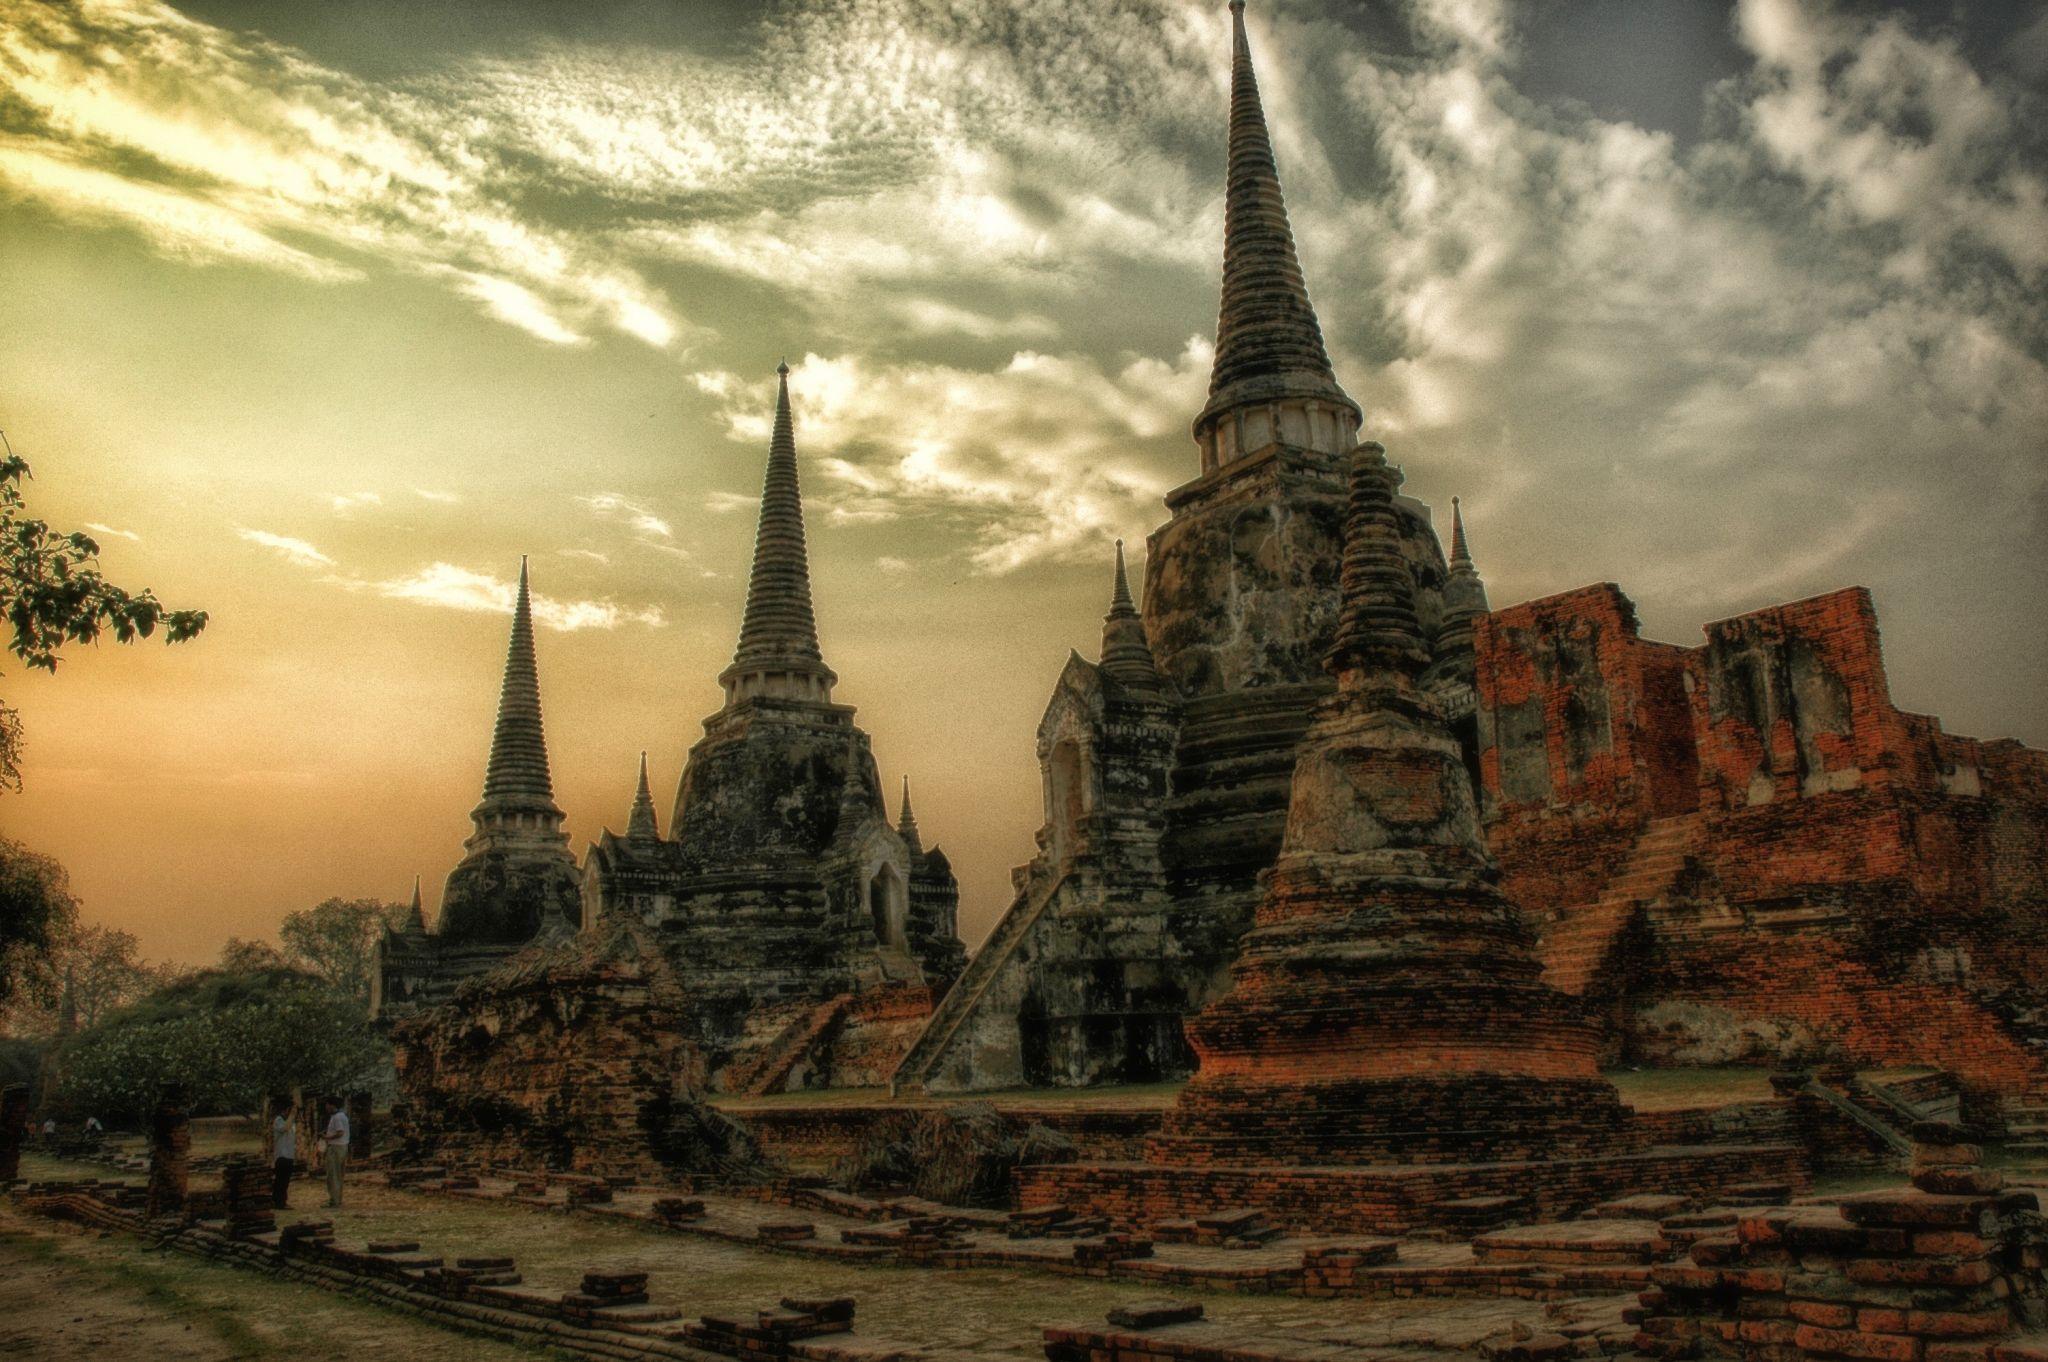 Ayutthaya Ancient City, Thailand